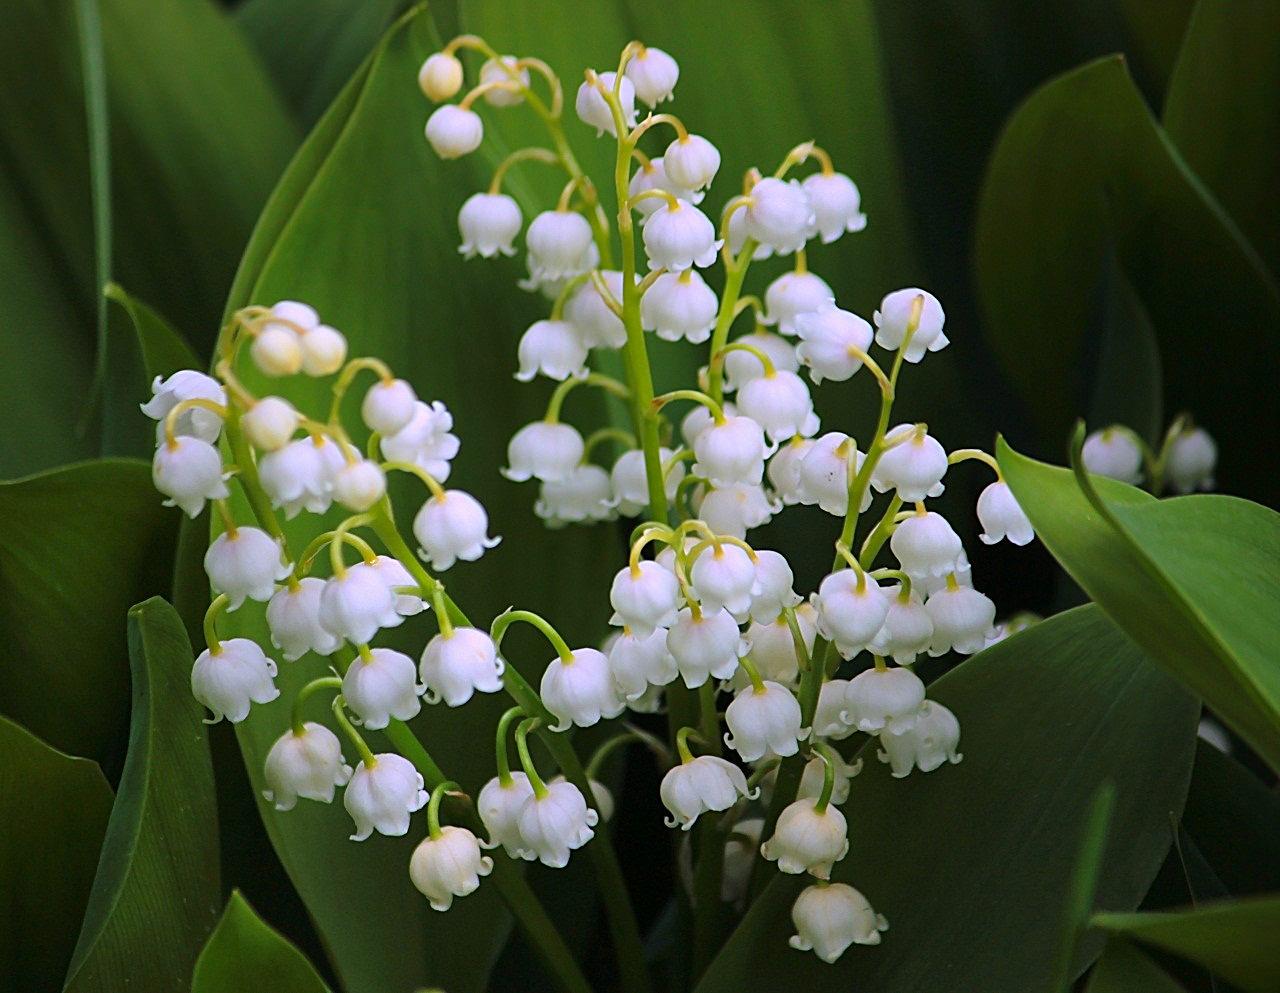 ландыш серебристый цветок фото странице представлен